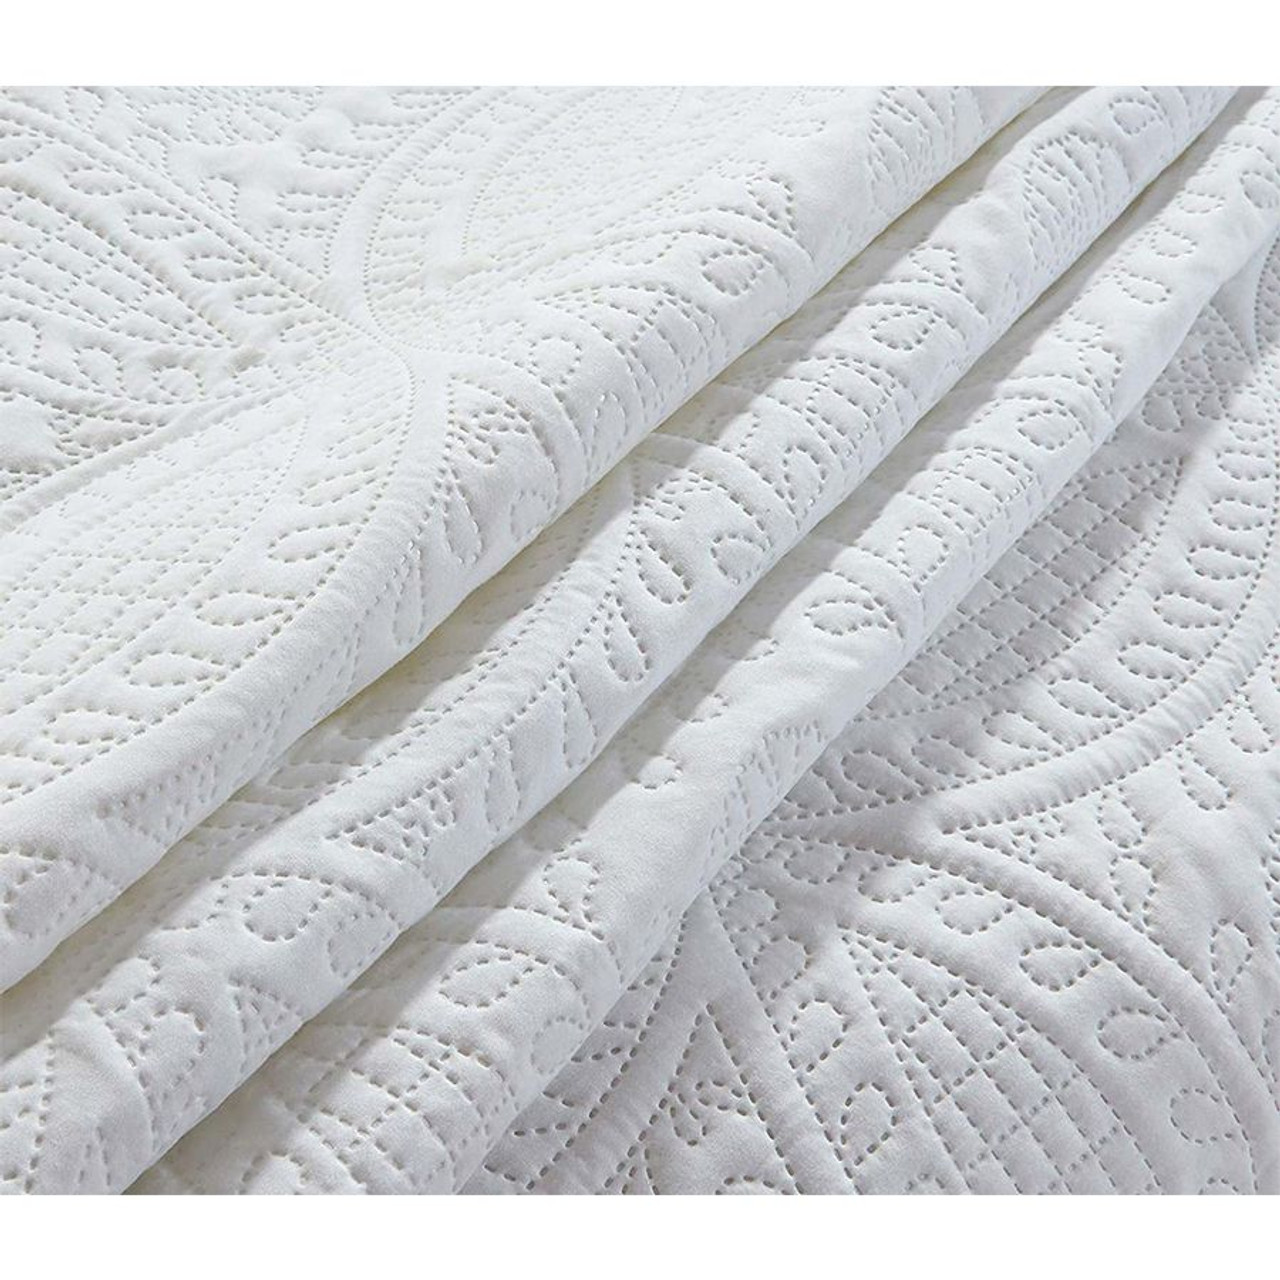 3 Pc Oversized Bedspread Coverlet Set White Color in USA, California, New York, NY City, Los Angeles, San Francisco, Pennsylvania, Washington DC, Virginia, Maryland